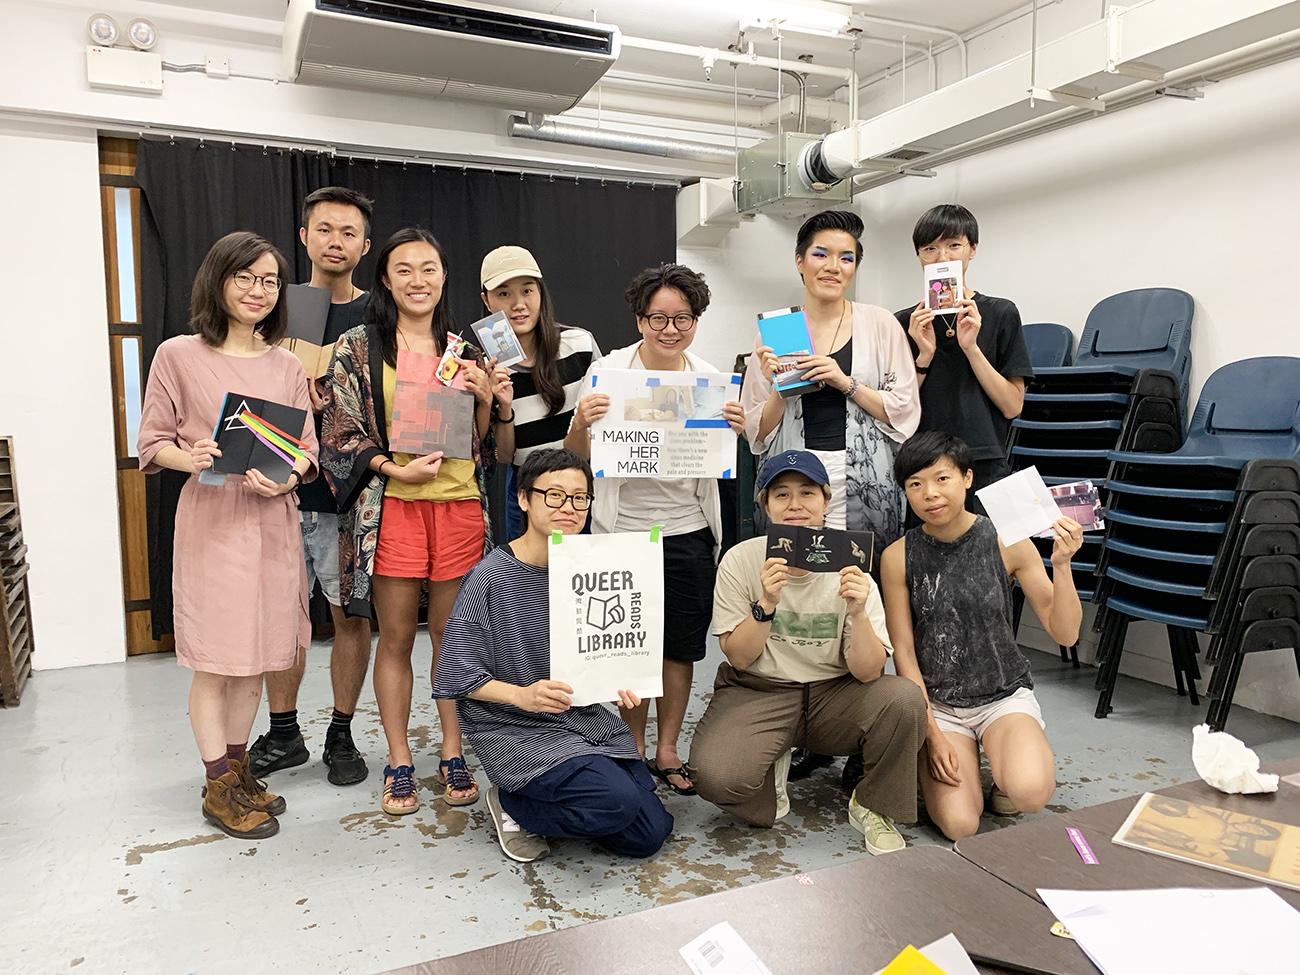 QRL_HKIPF_July 13.jpg